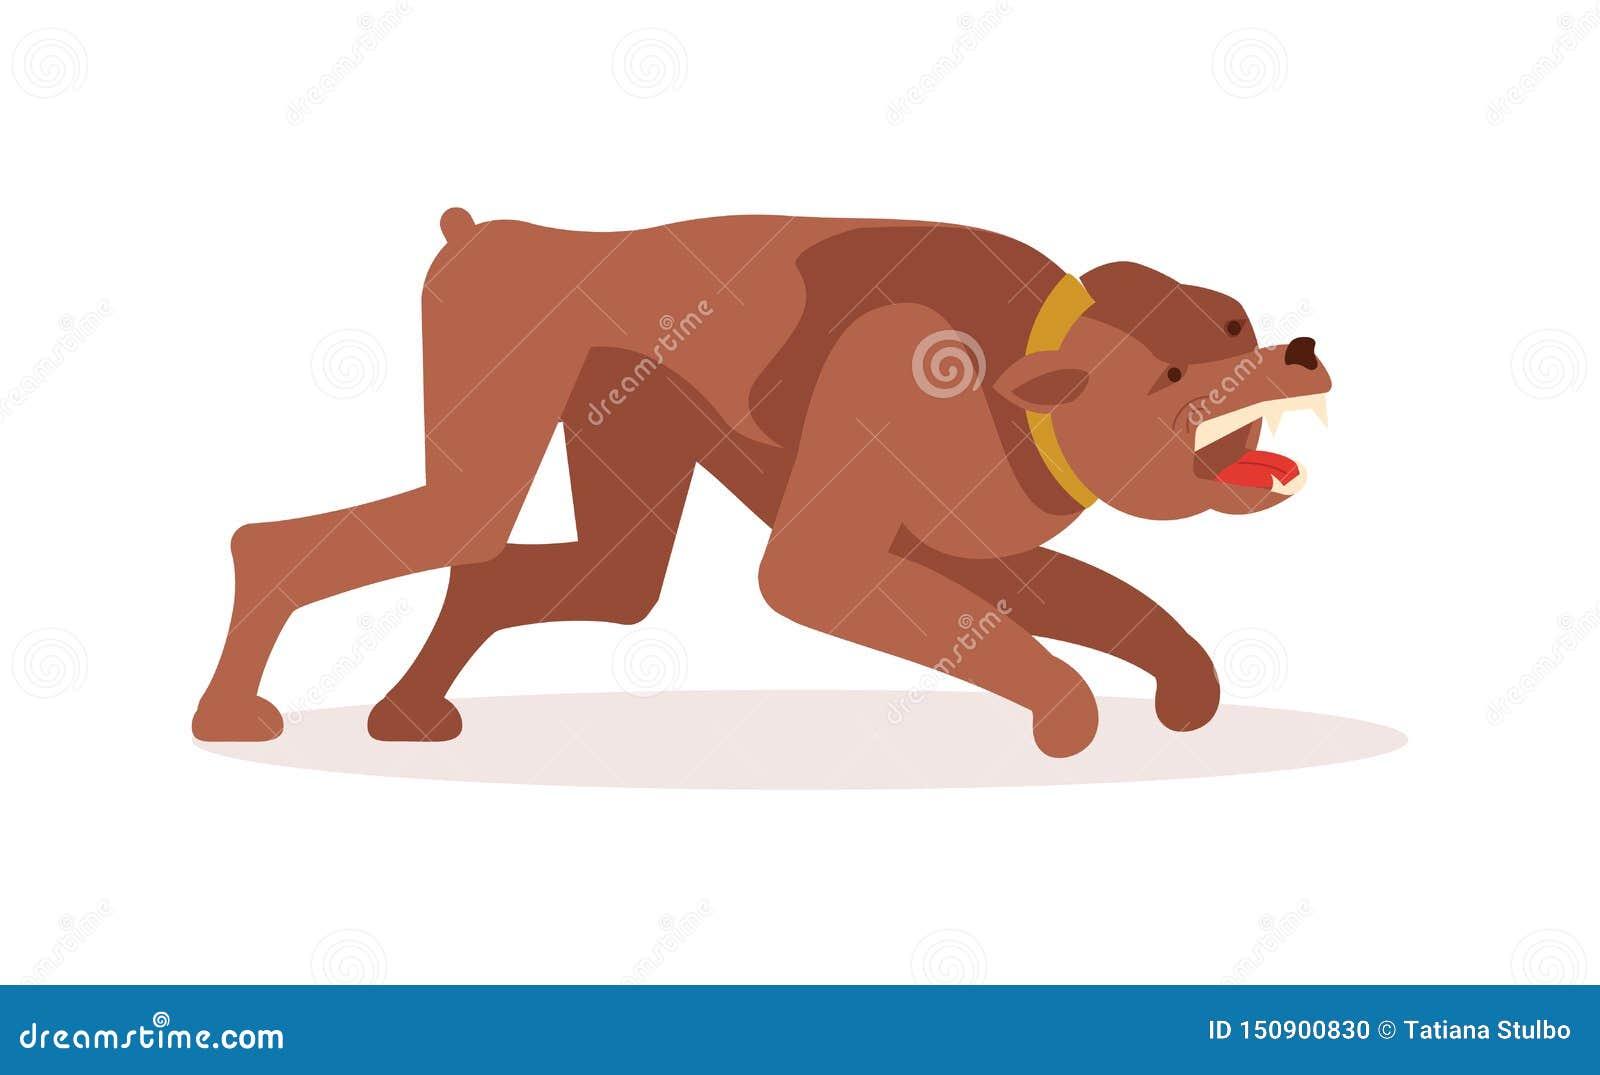 Doberman Vector Attack Dog - Rottweiler Clip Art - Png Download (#5561673)  - PinClipart